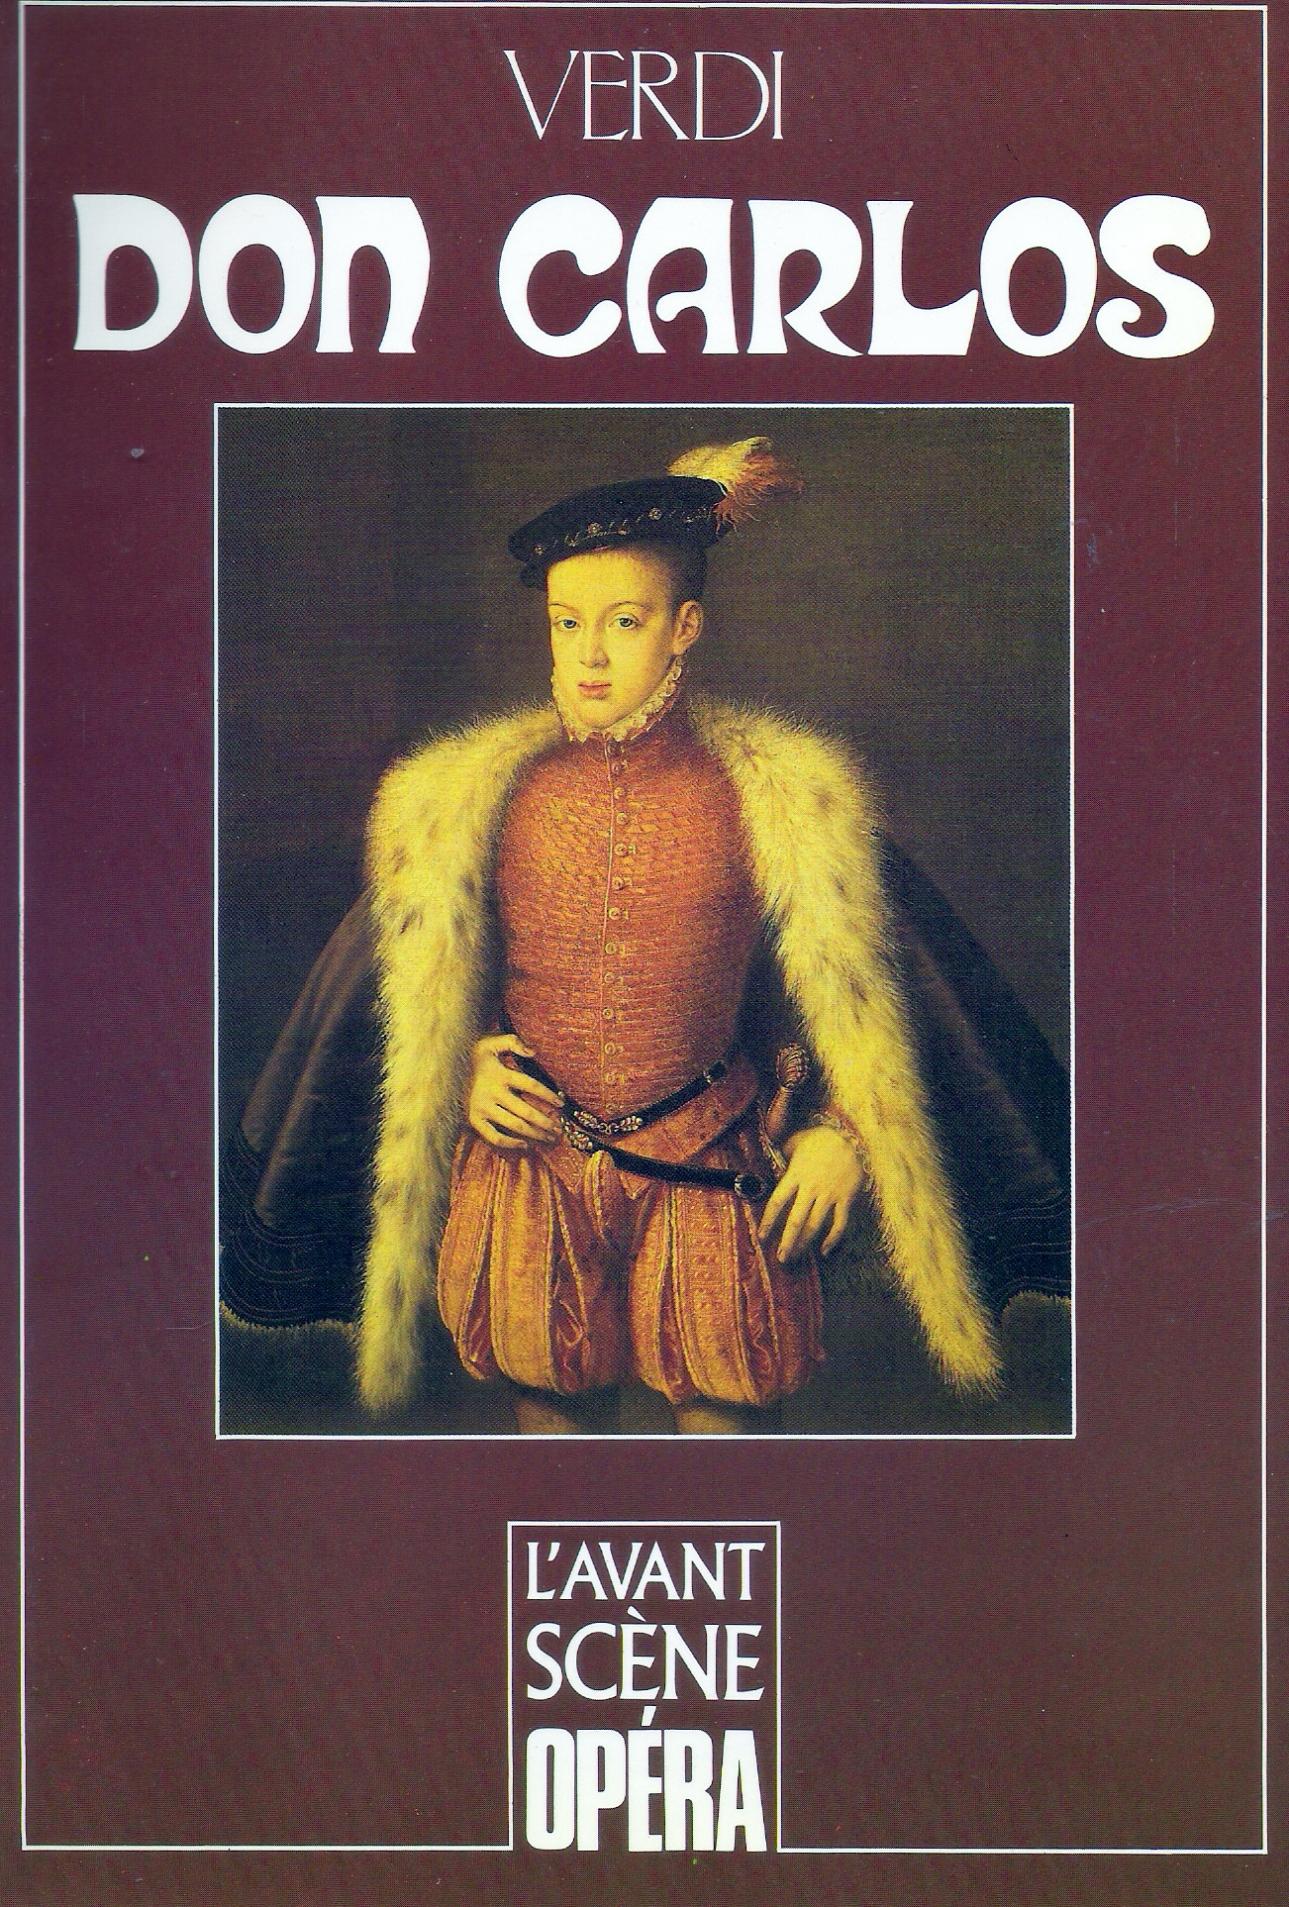 Verdi Don Carlos